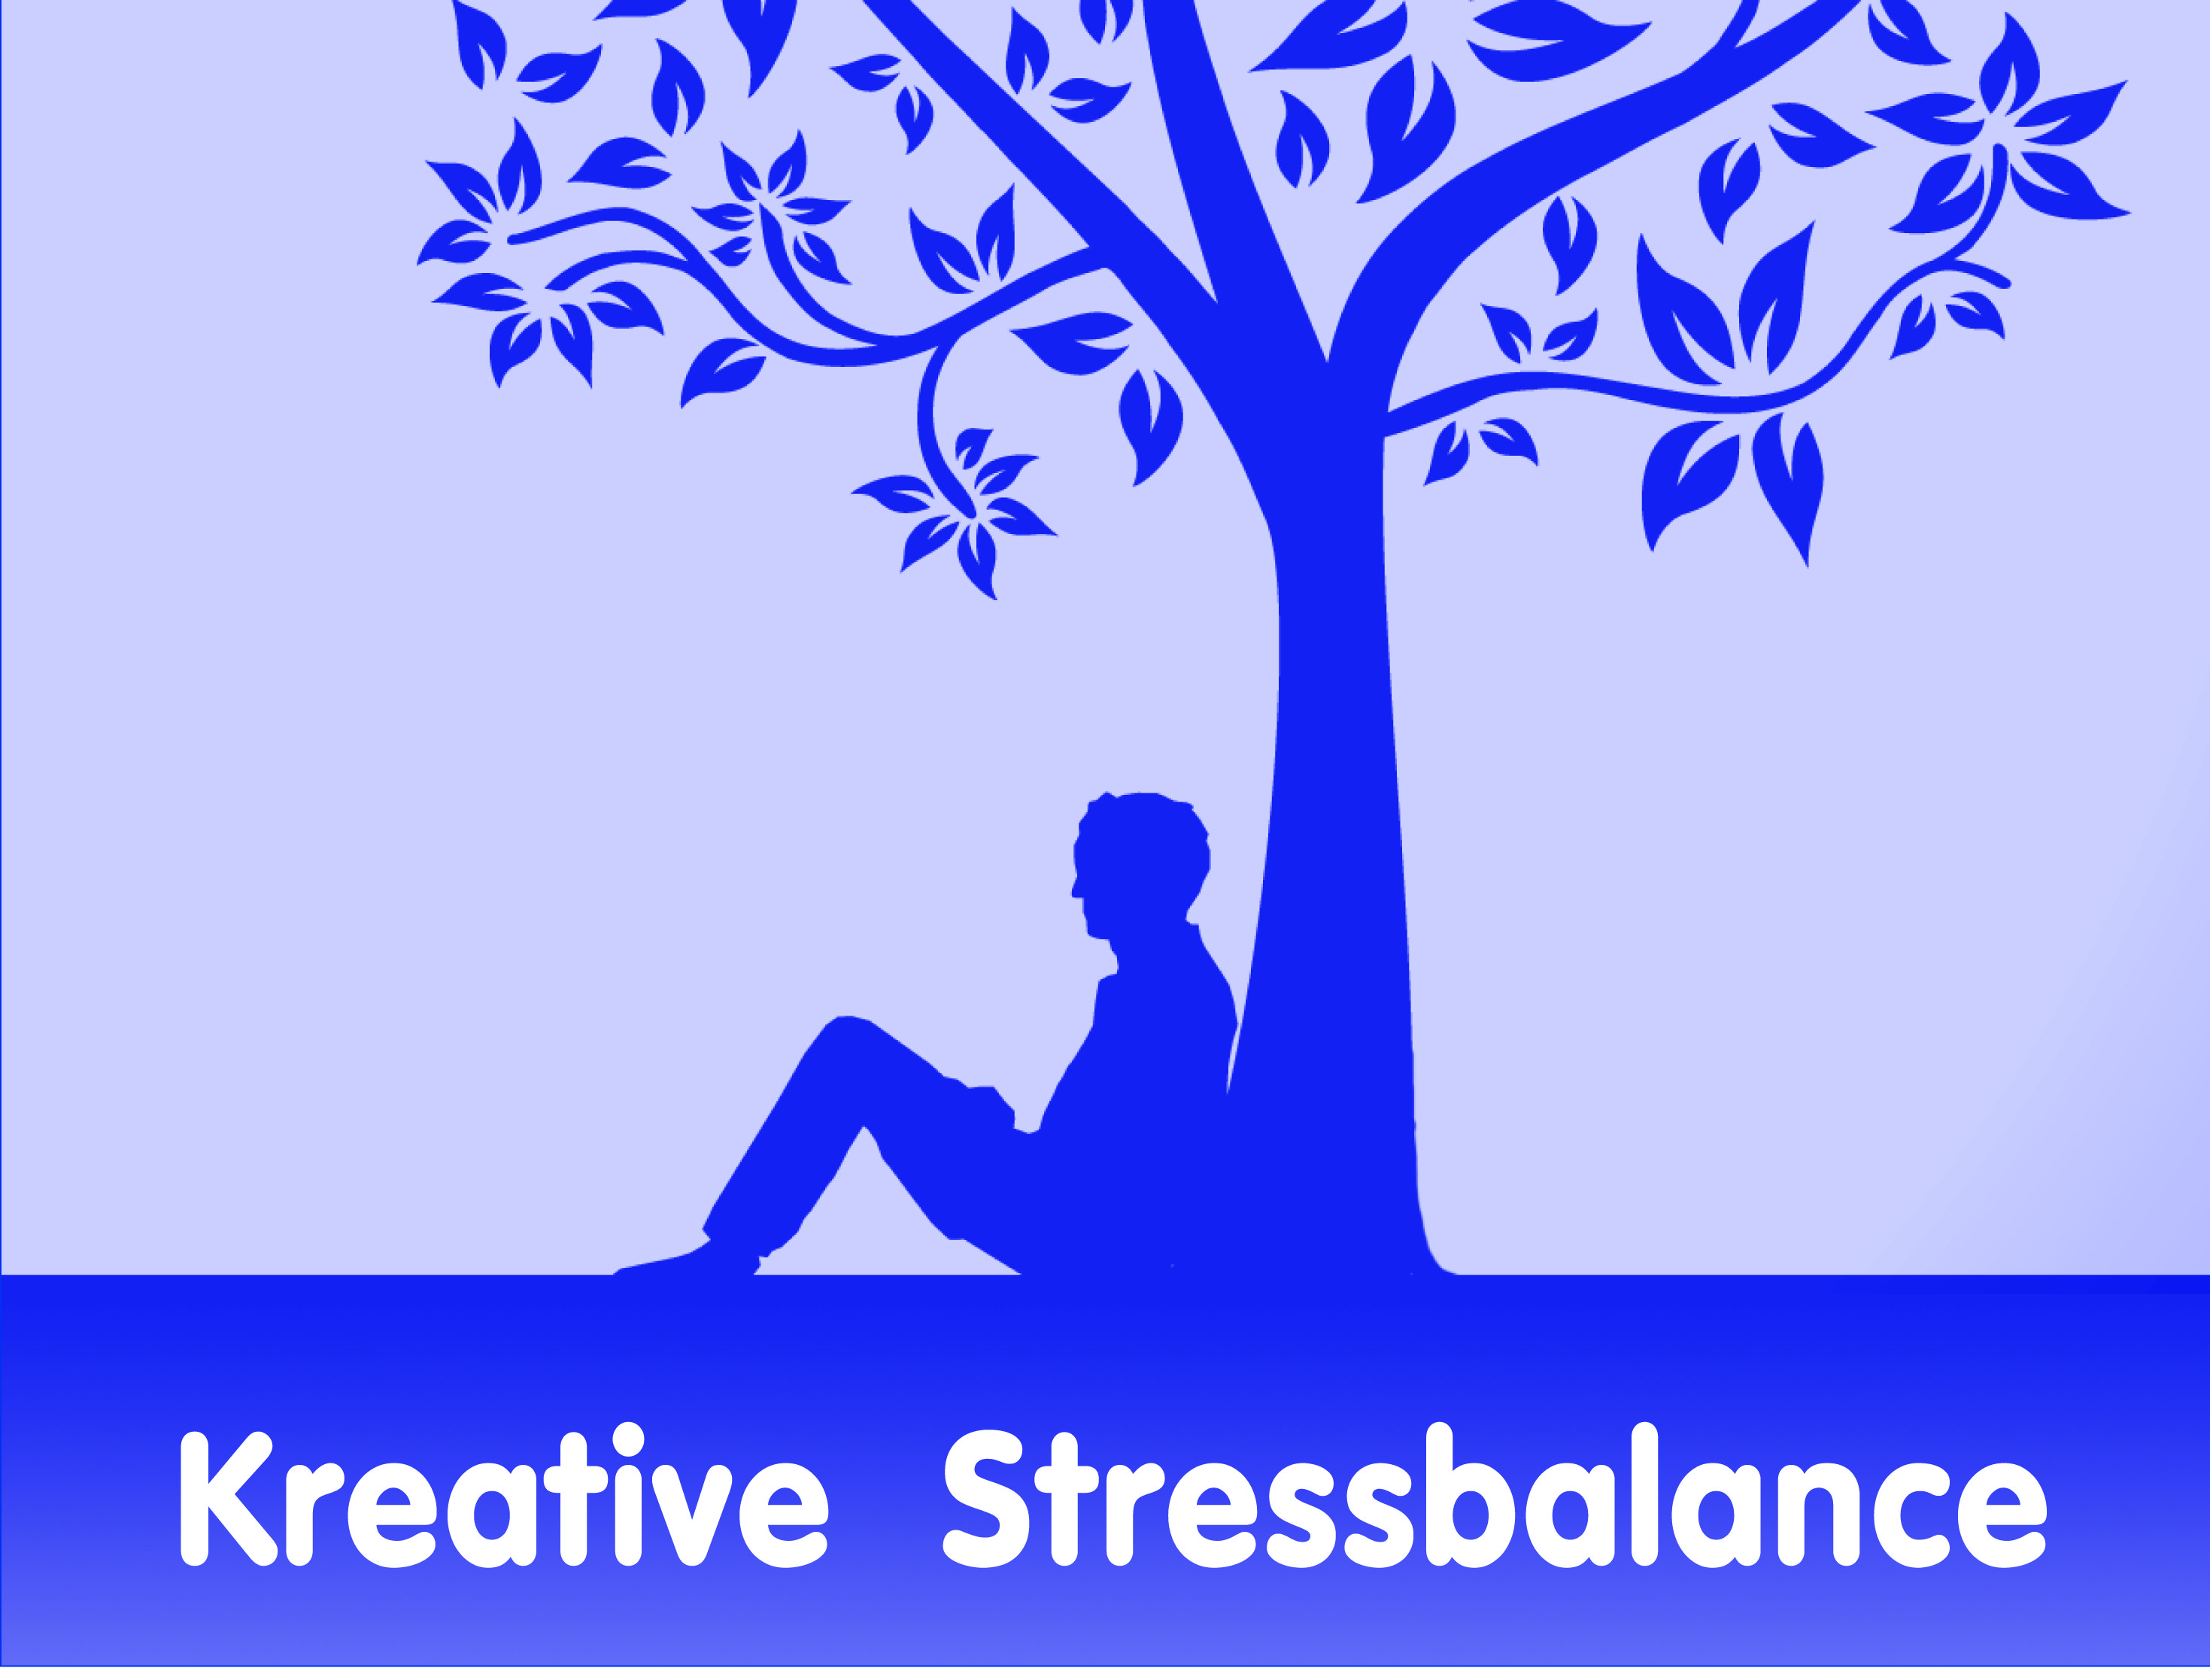 Stressbalance Bild